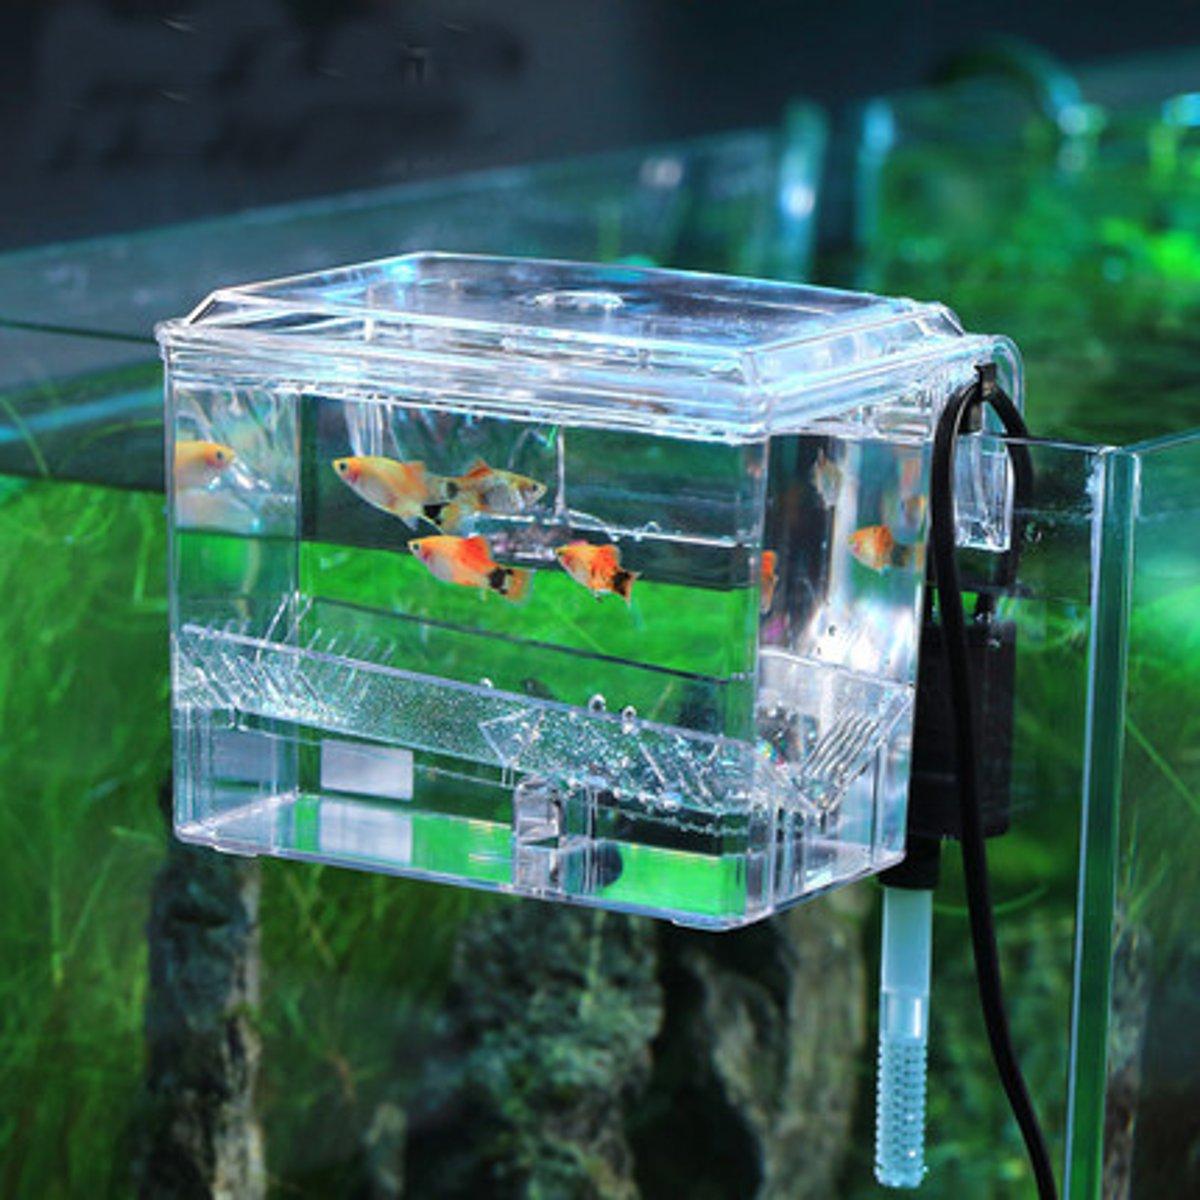 Aquarium Tank External Hang-on Breeder Fish Breeding for Hatchery